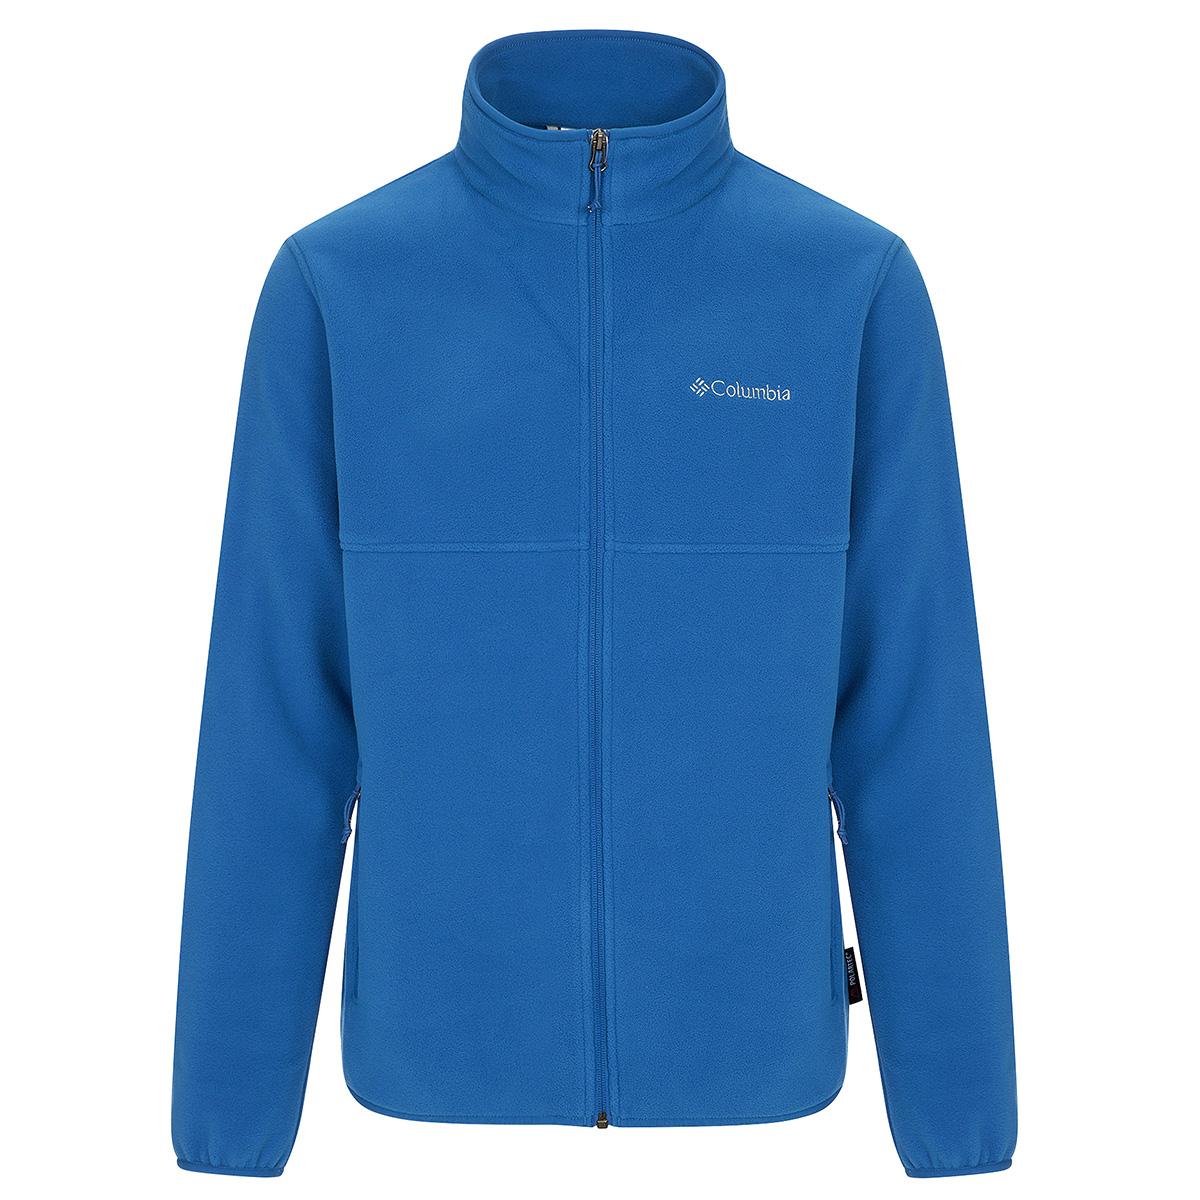 Columbia Menu0026#39;s Fuller Ridge Fleece Jacket 1644091 Pond Super Blue | EBay